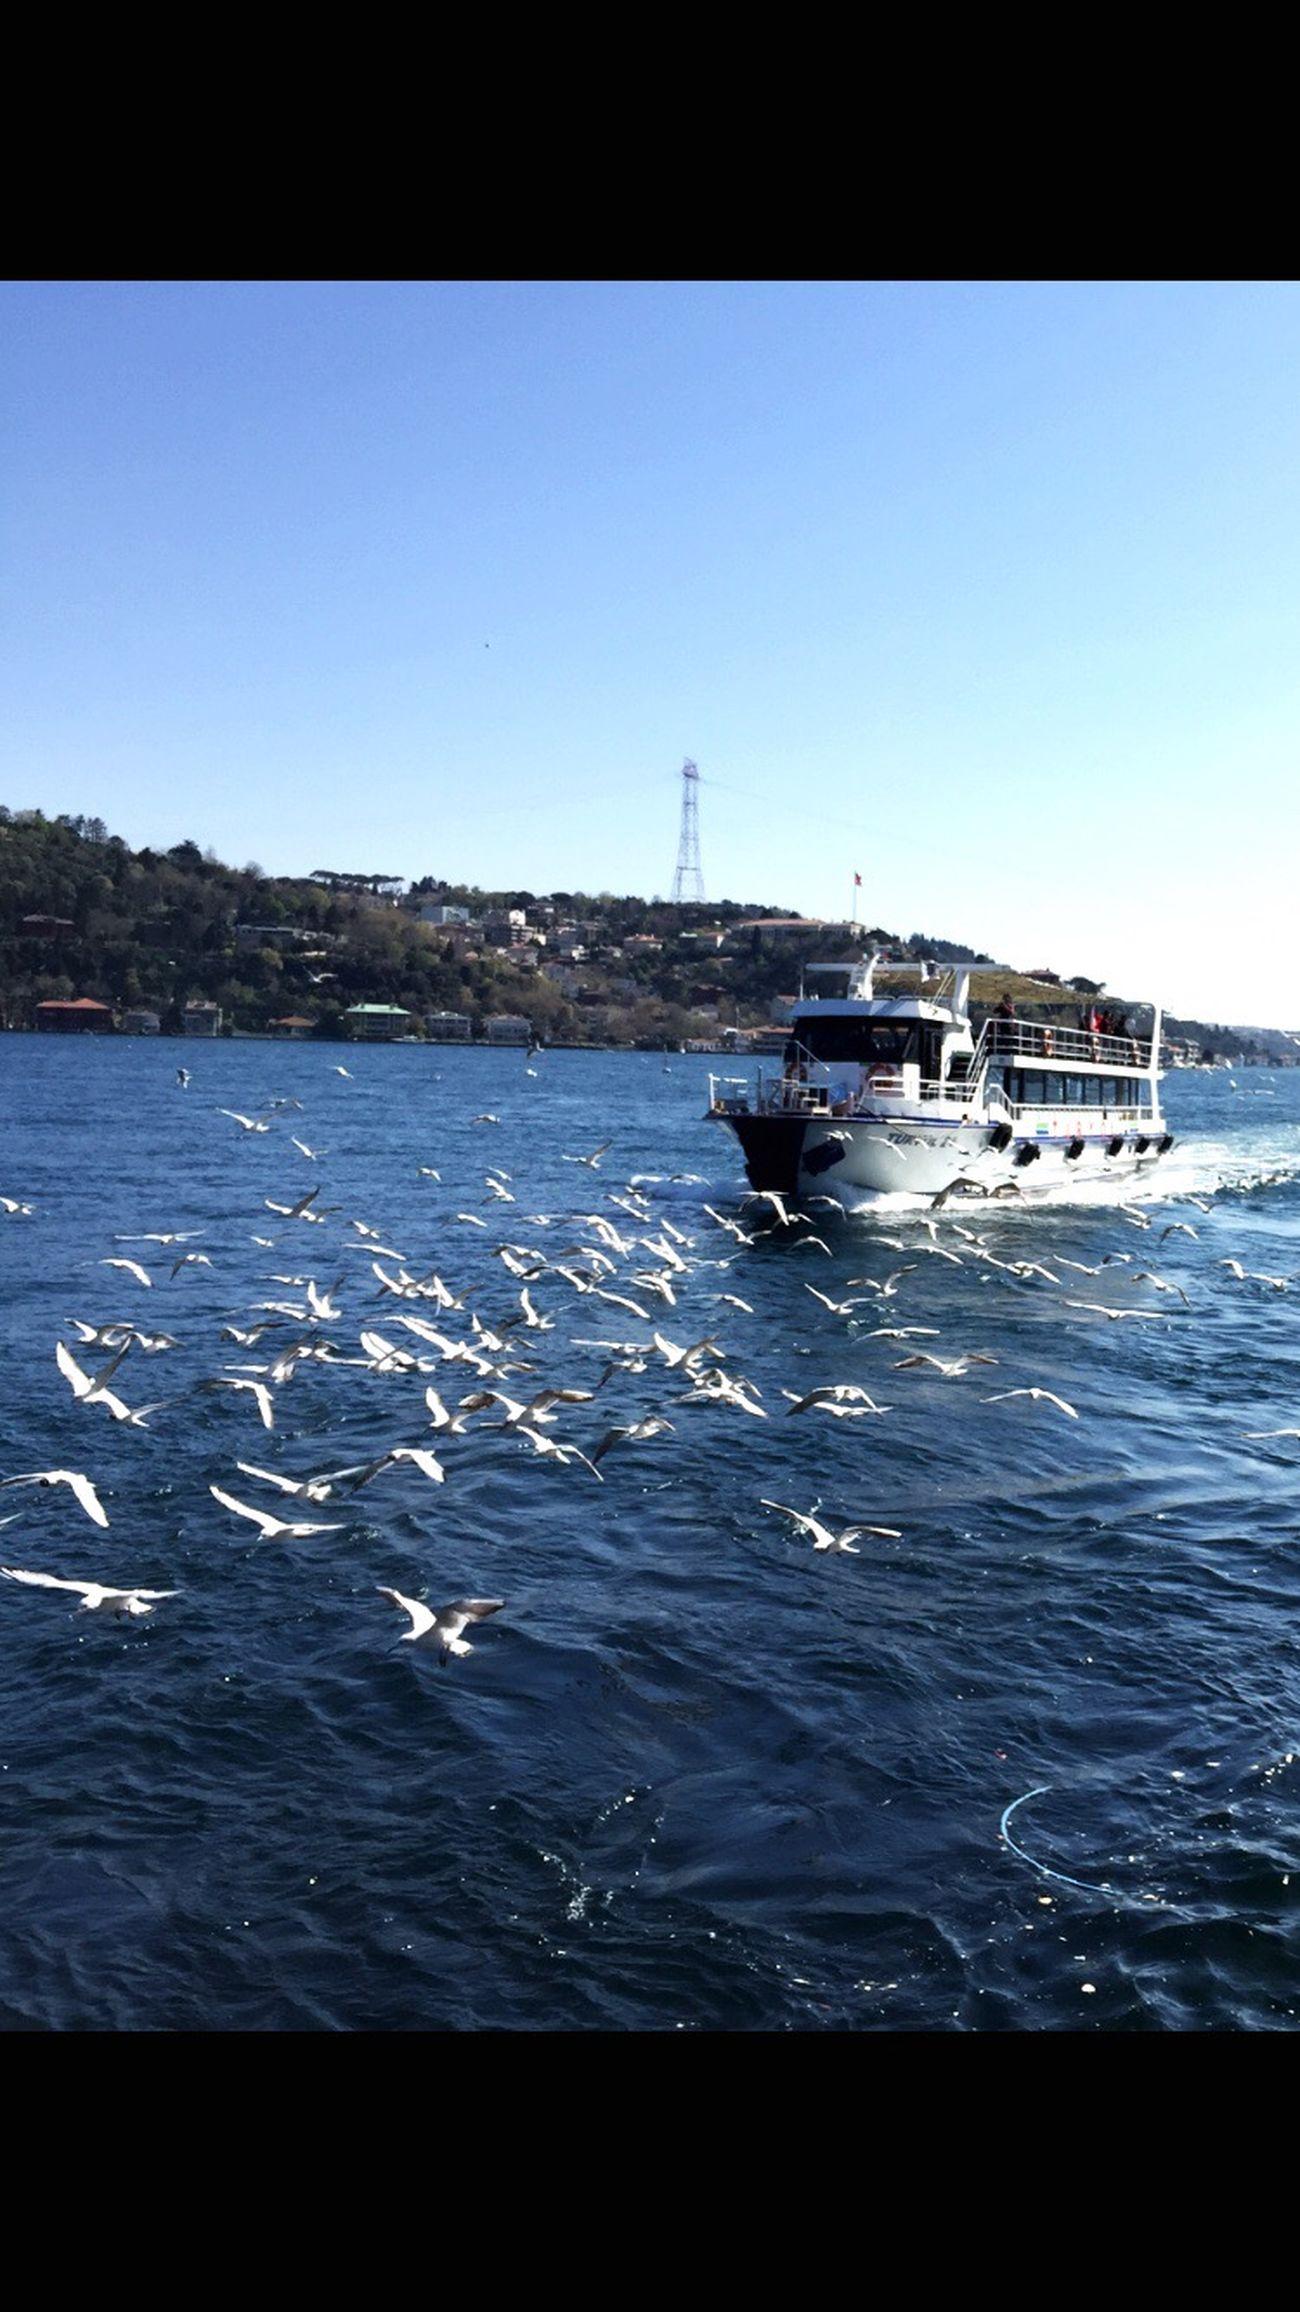 Istanbul Turkey Istanbul Istanbul - Bosphorus Istanbulove Bebek Sea Like Likeforlike Comeseeturkey Touristic Wonderful Love Millennial Pink EyeEmNewHere